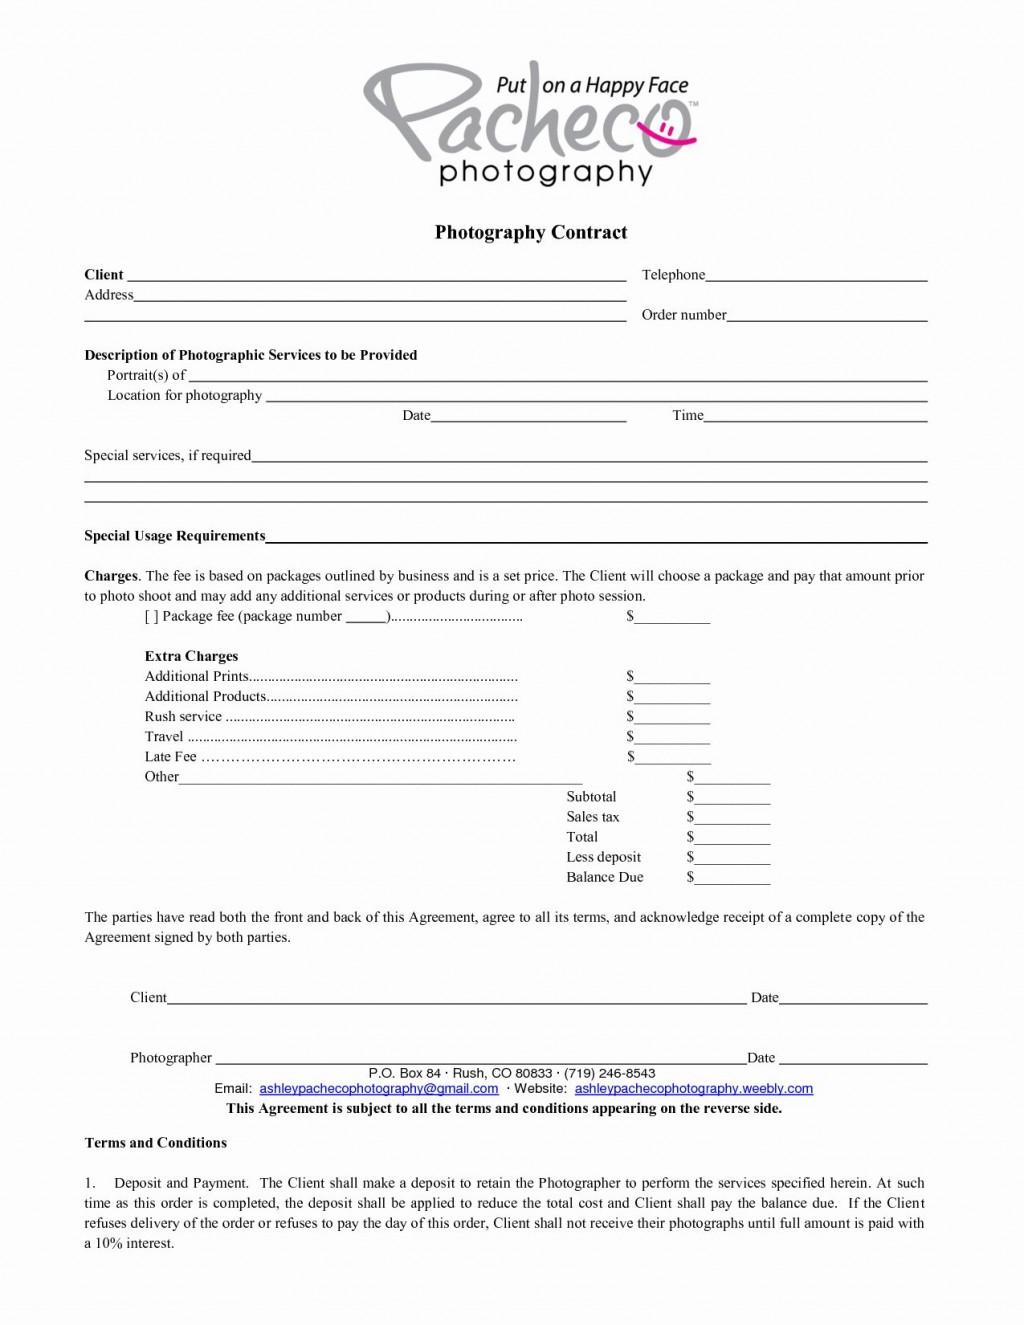 000 Wonderful Portrait Photography Contract Template Sample  Pdf AustraliaLarge